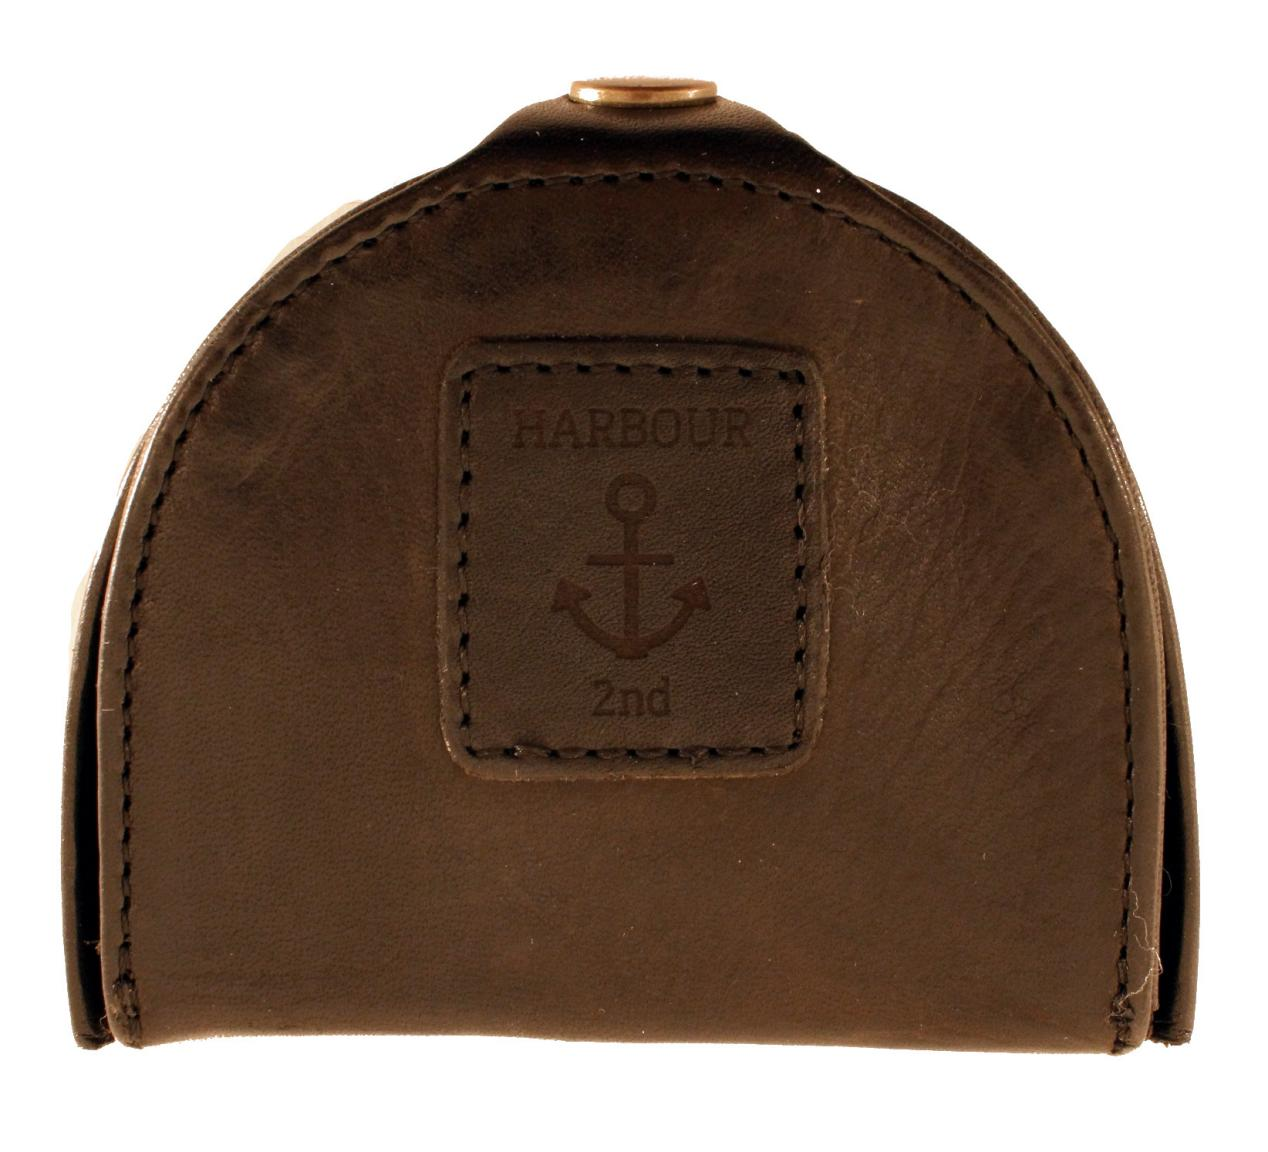 Harbour 2nd Gigerl Hufeisenportmonee Dlba Cognac